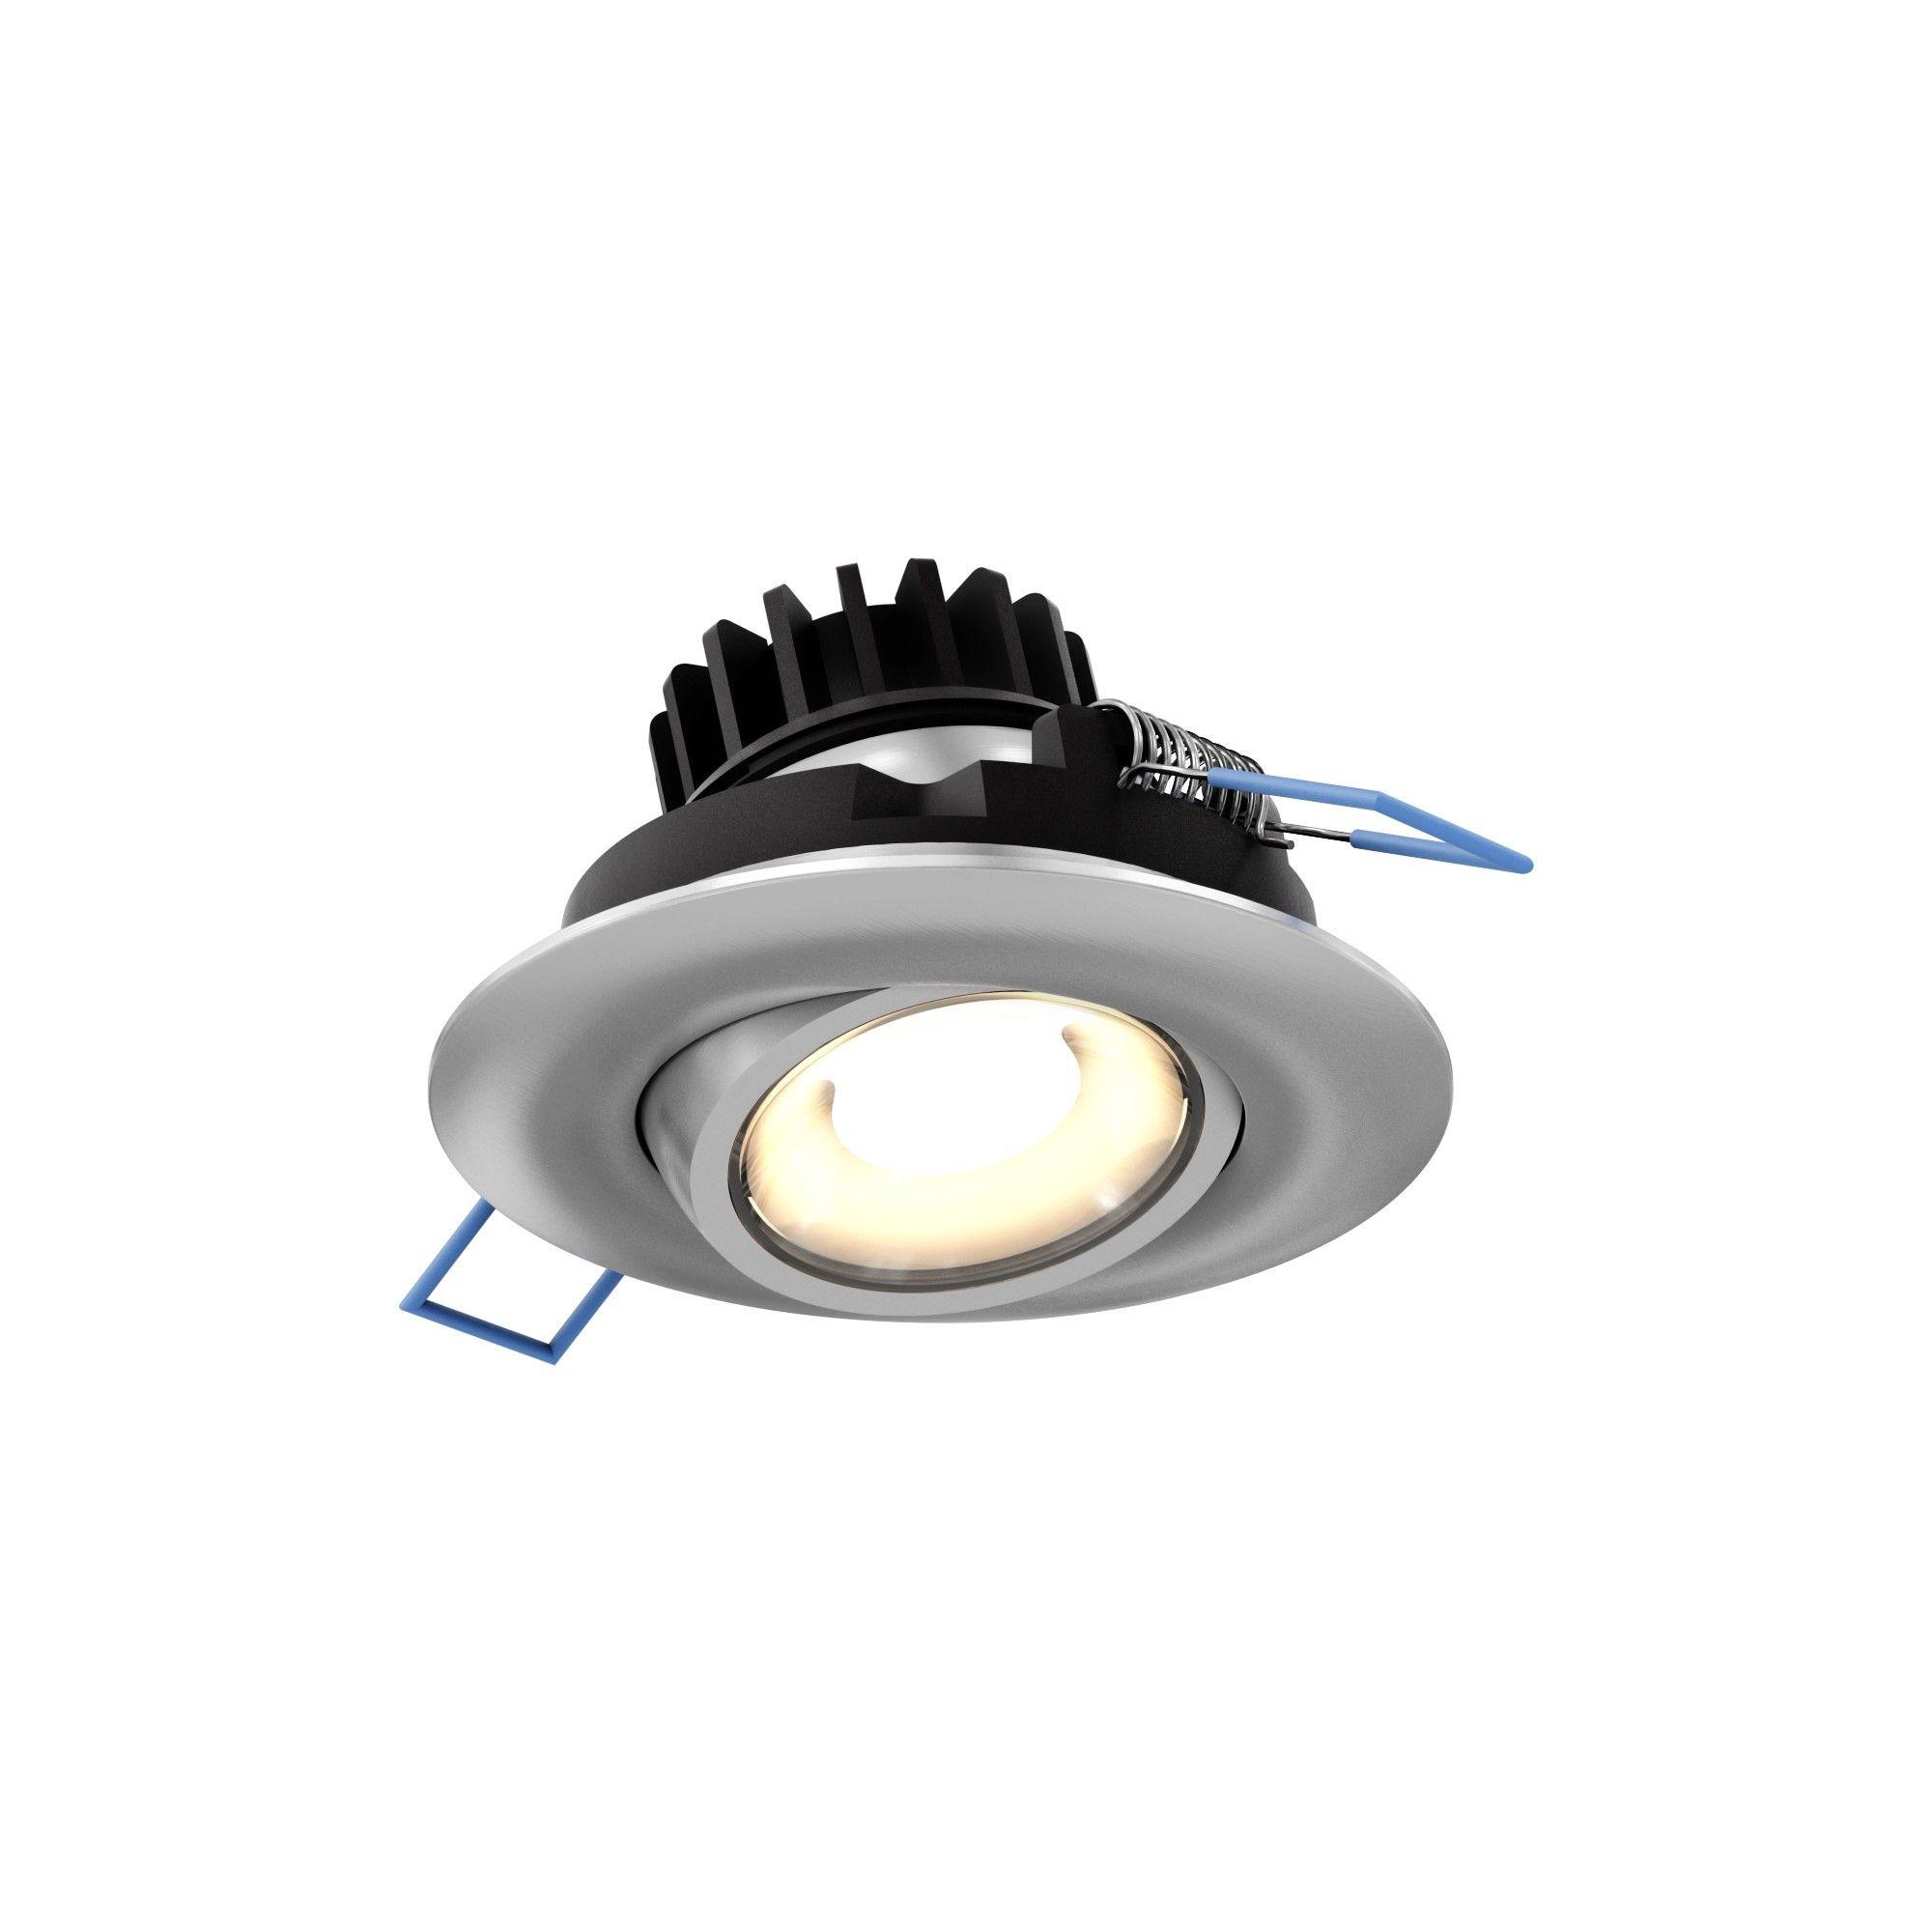 Dals Lighting Leddowng3 Led Gimbal 3 Adjustable Recessed Fixture Satin Grey Recessed Lighting Recessed Lighting Kits Led Kit